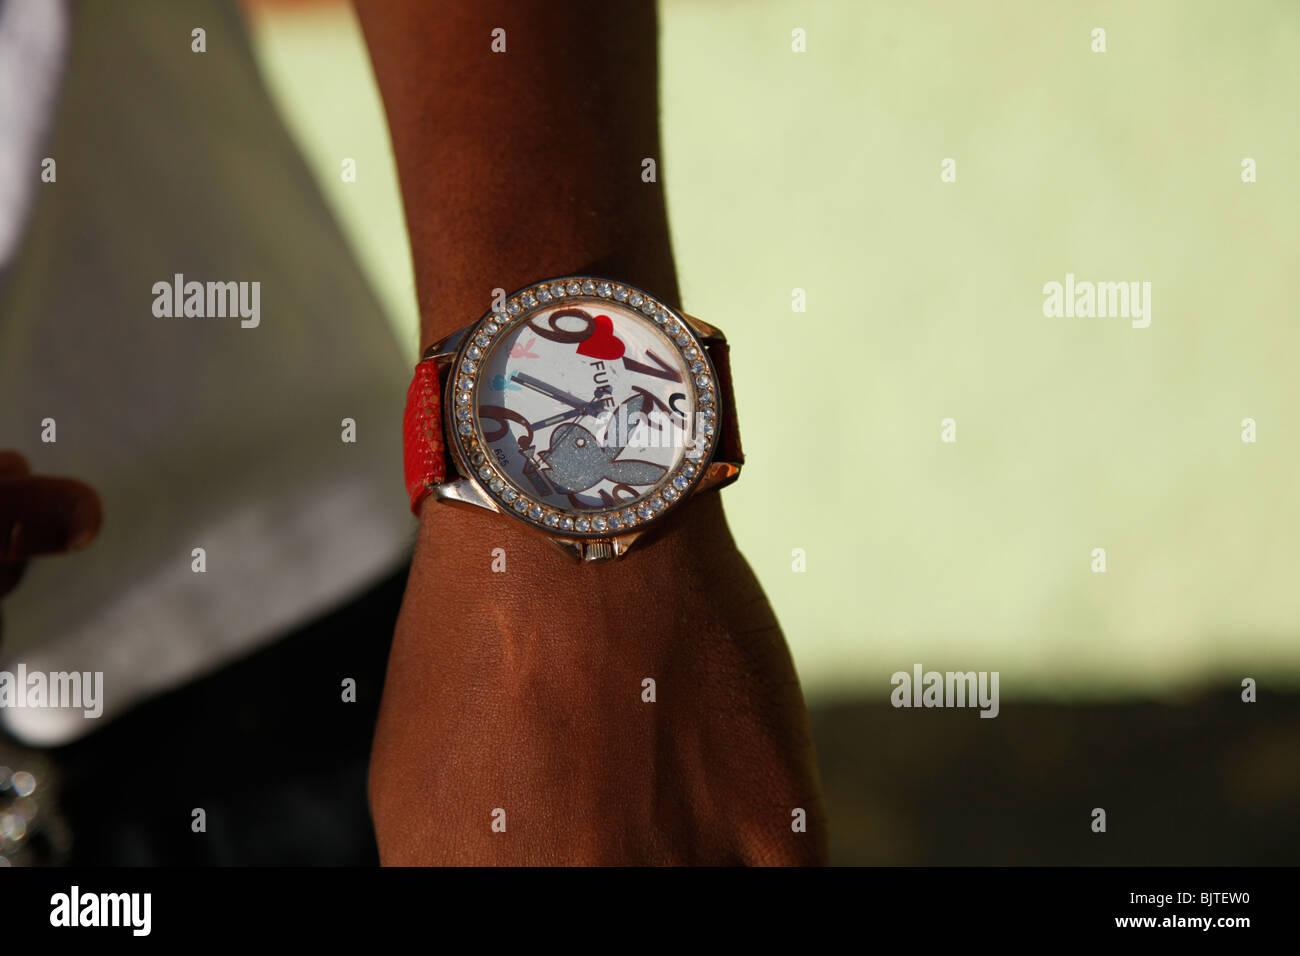 Diamante Play boy watch. Angola, Africa. © Zute Lightfoot - Stock Image